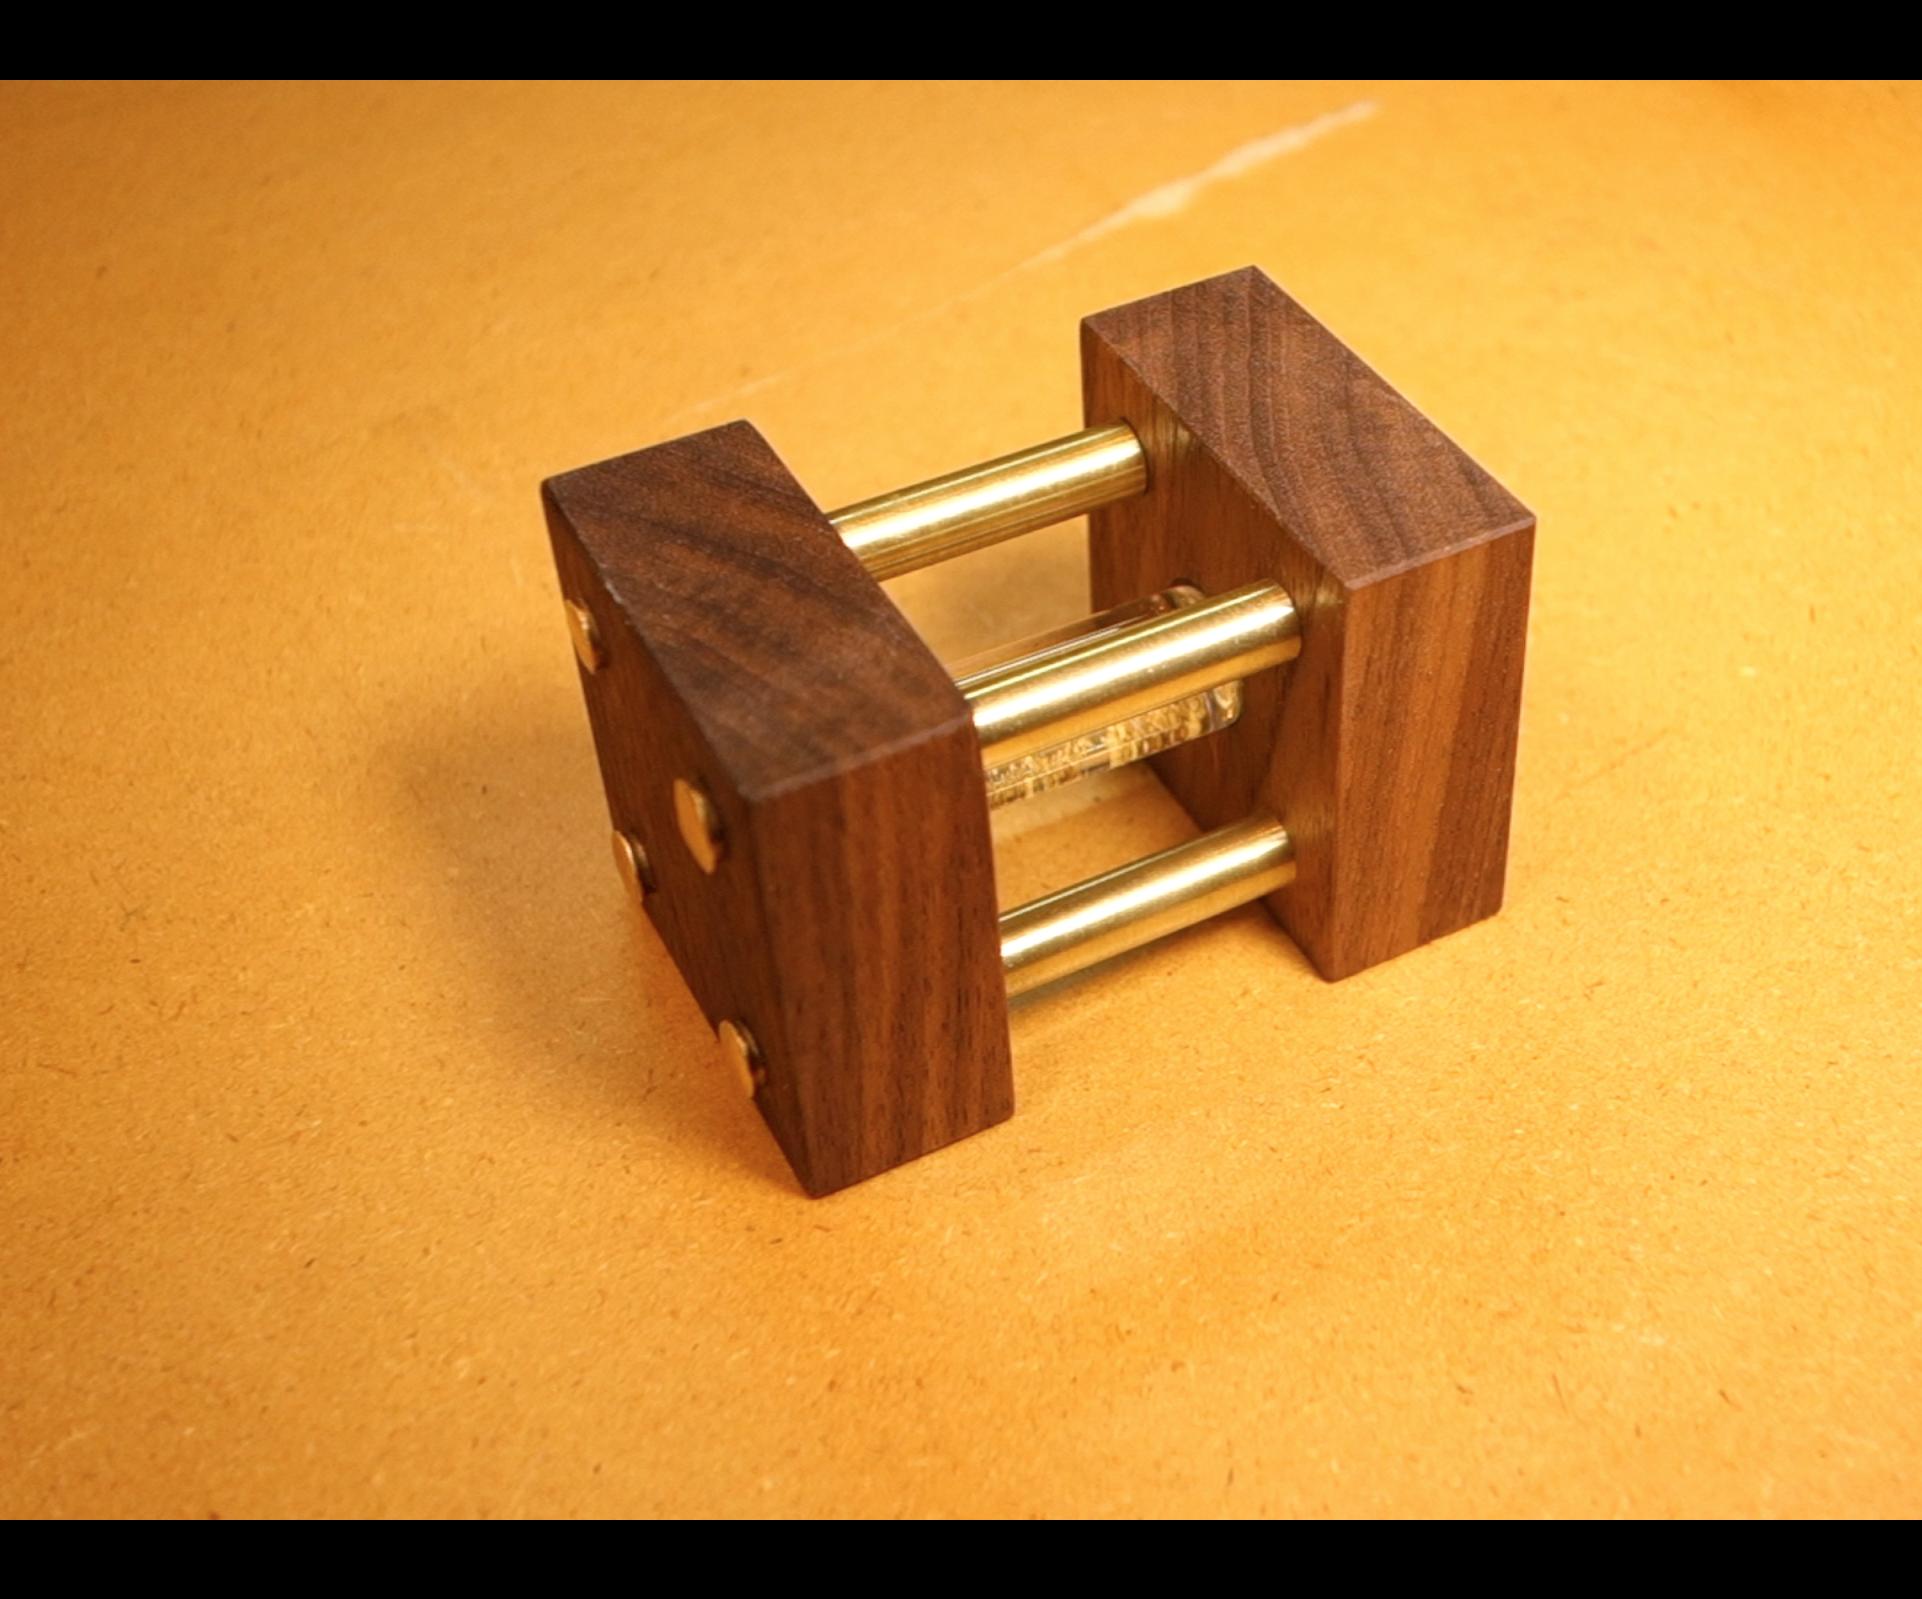 Make It - Gold / Glass Vial Holder